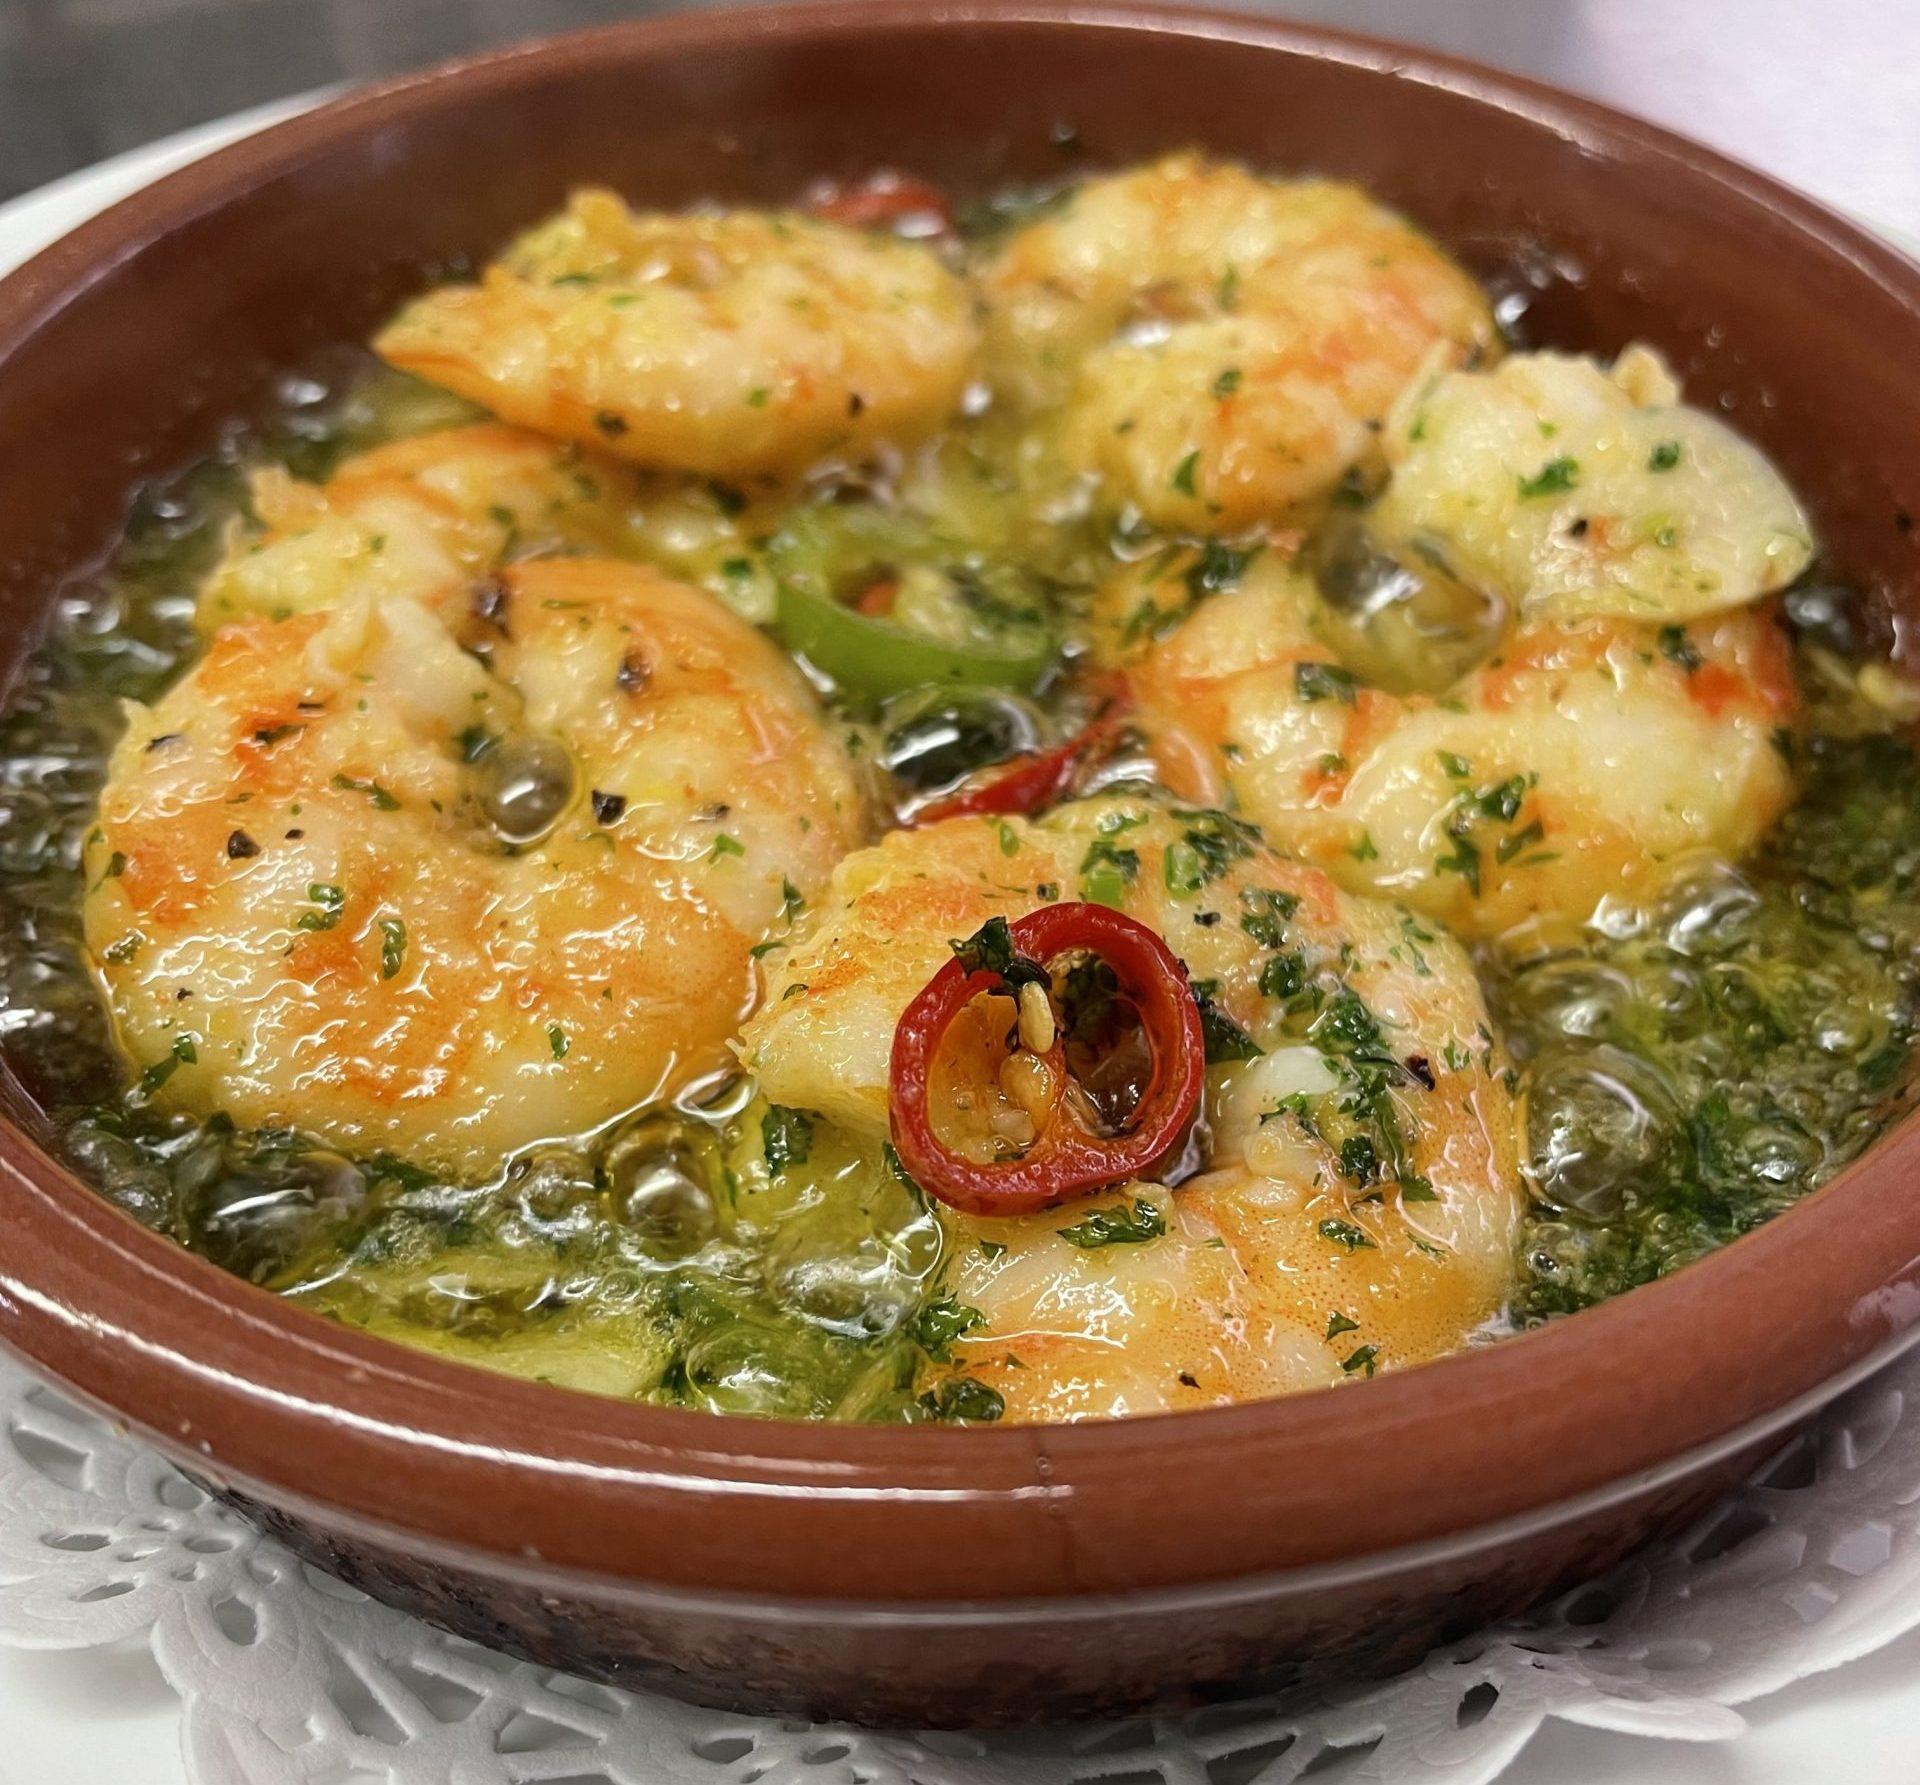 Chilli & Garlic Prawn Pil